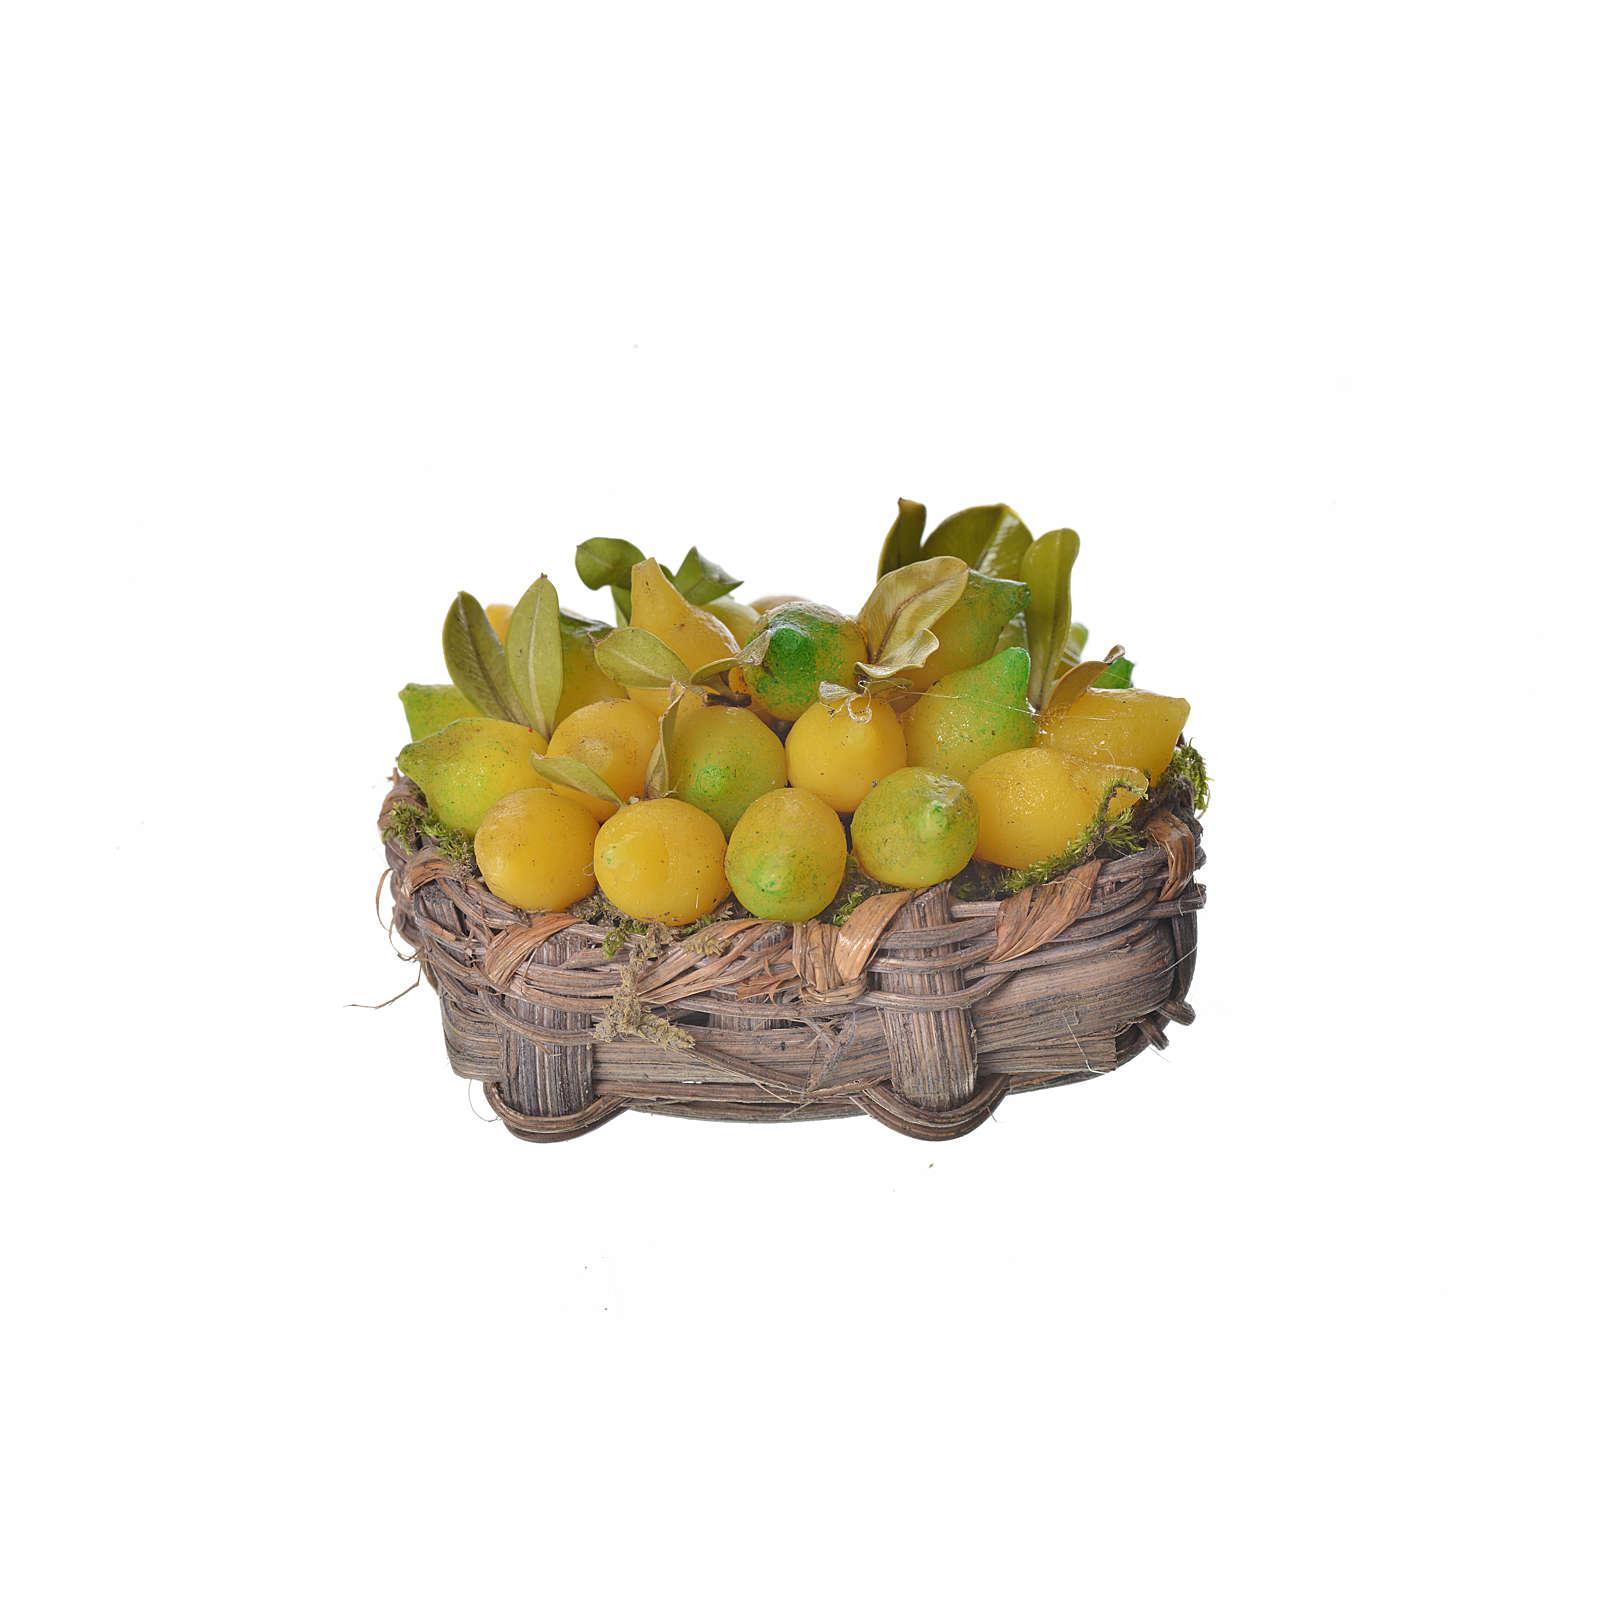 Cesto limoni in cera 4,5x5,5x6 4